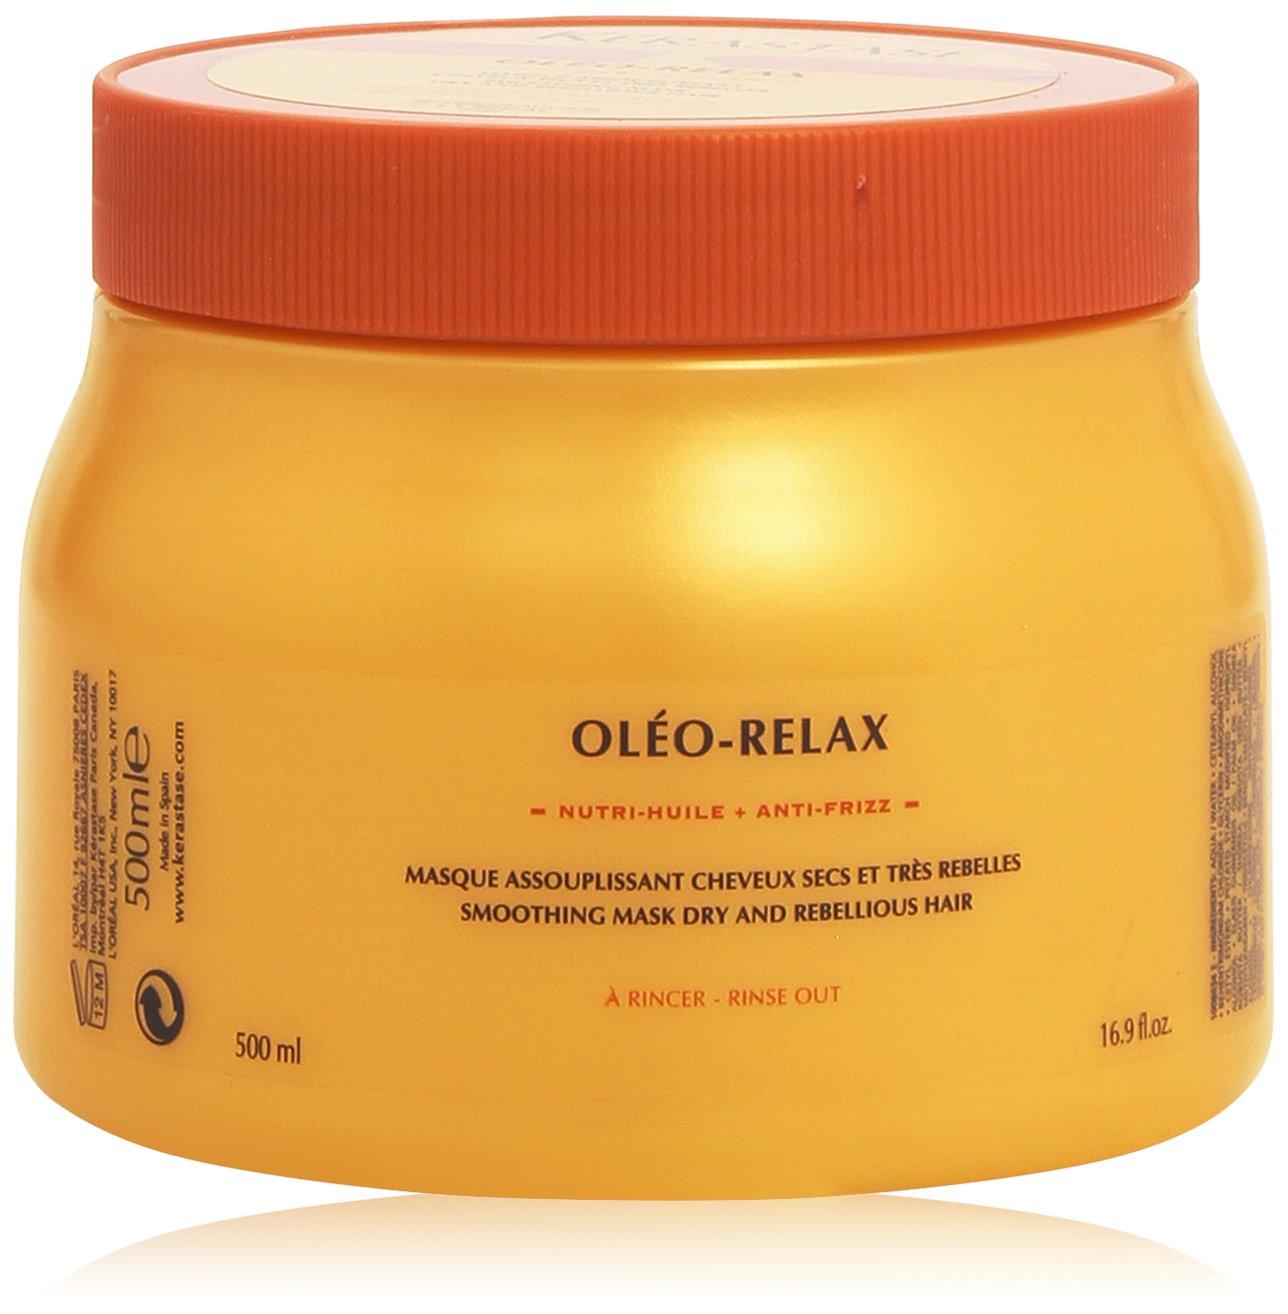 KERASTASE NUTRITIVE OLEO-RELAX masque 500 ml Kérastase 250080 16579